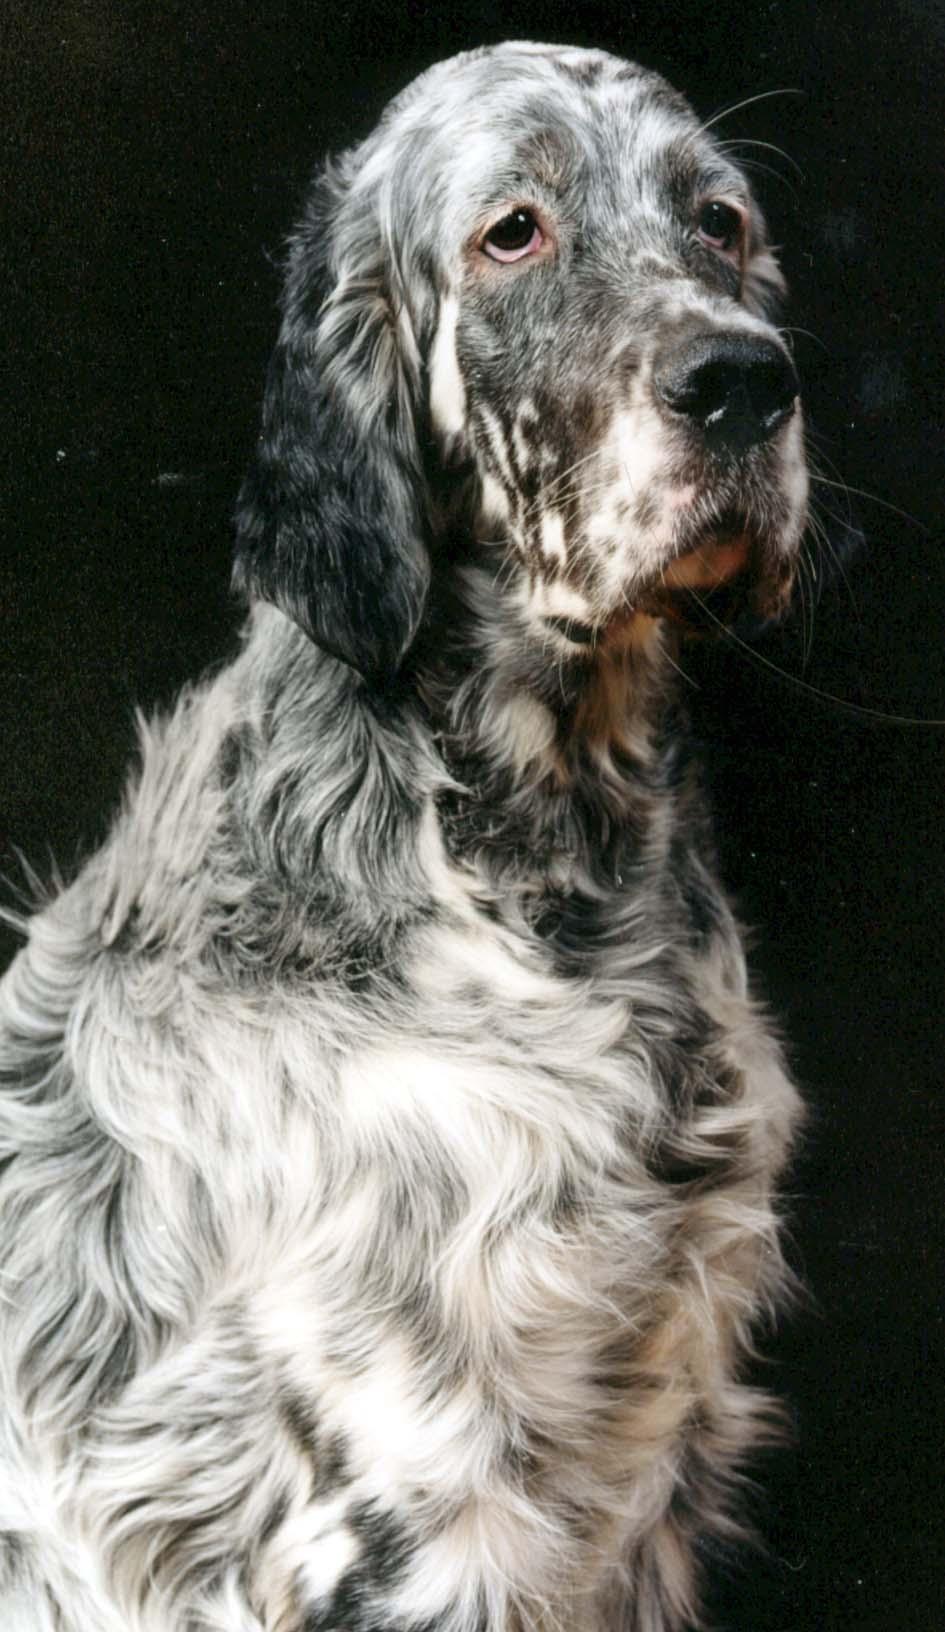 Sad English Setter dog wallpaper